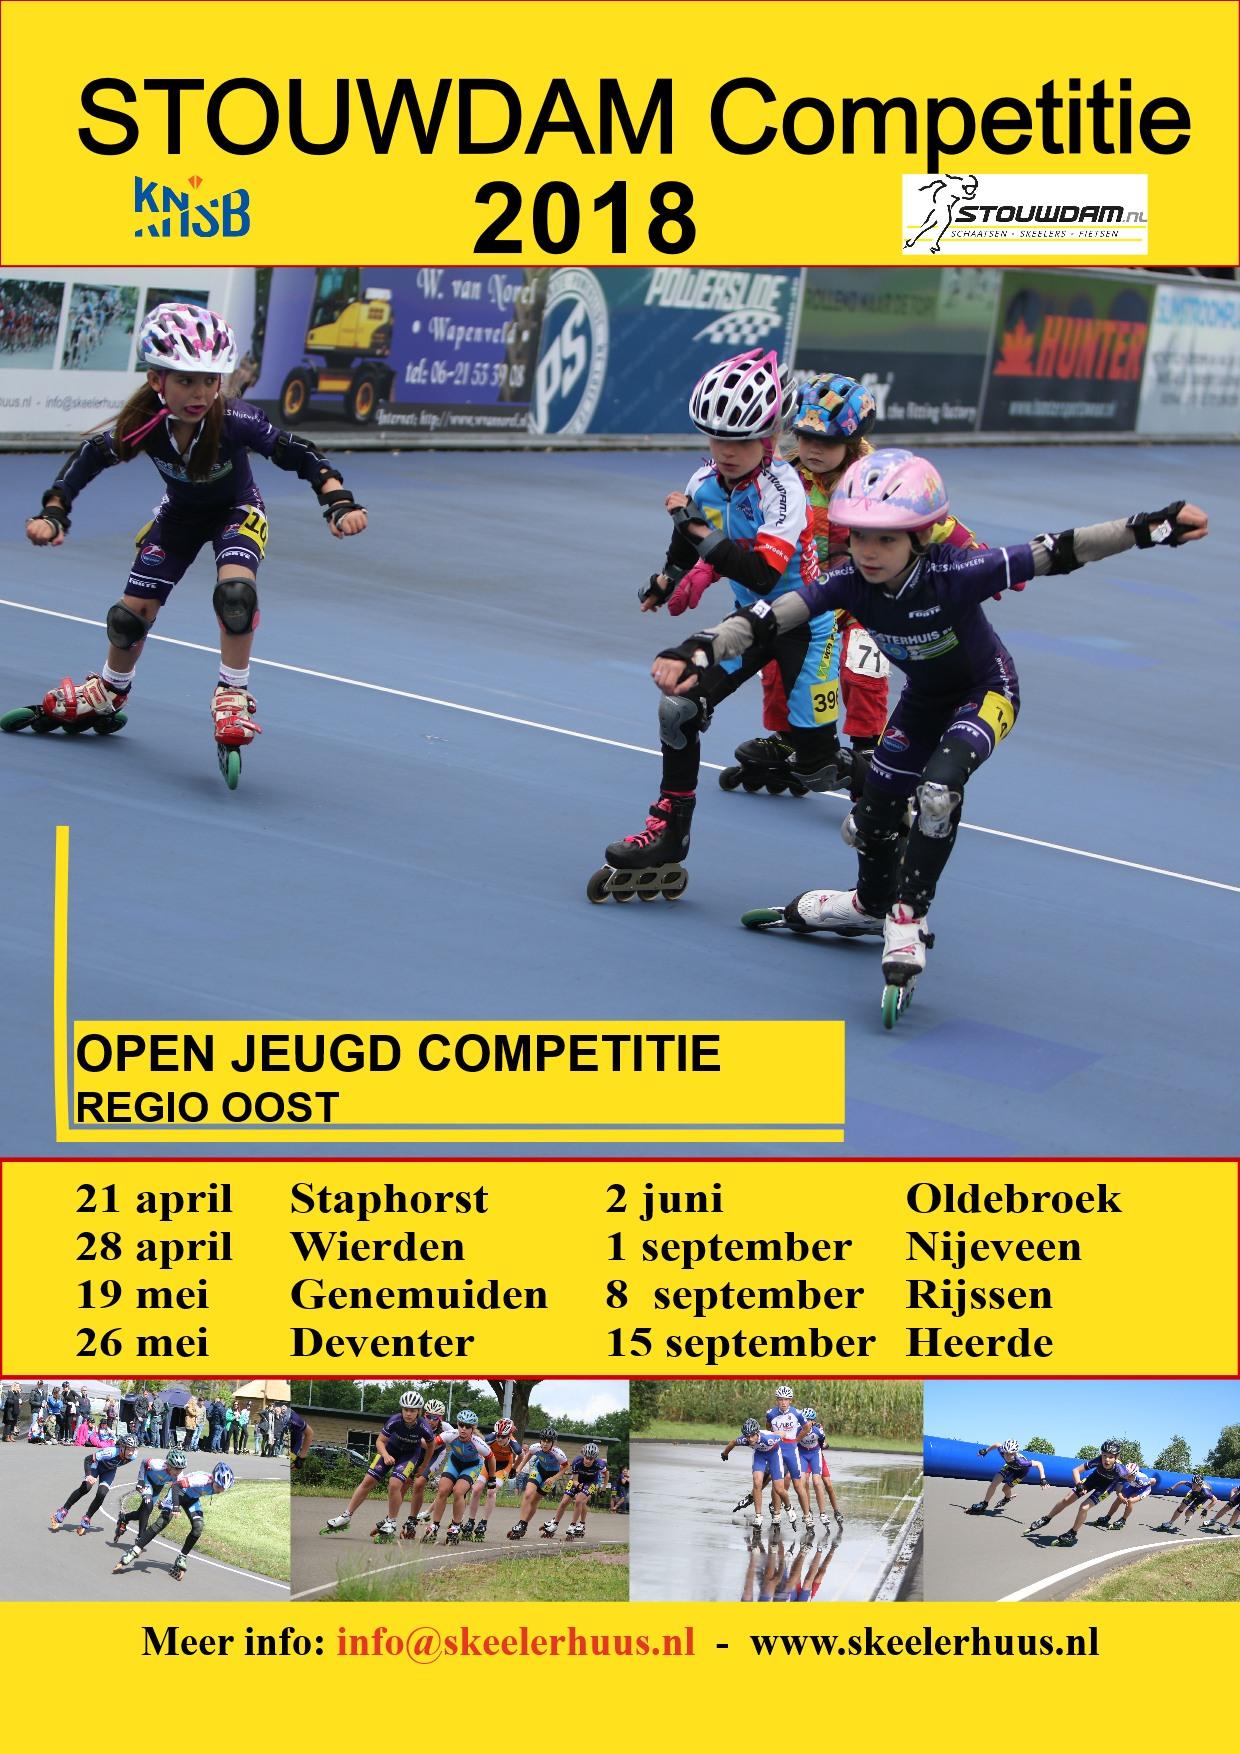 d0048ffabf0 Stouwdam Competitie 5   Schaatsen.nl